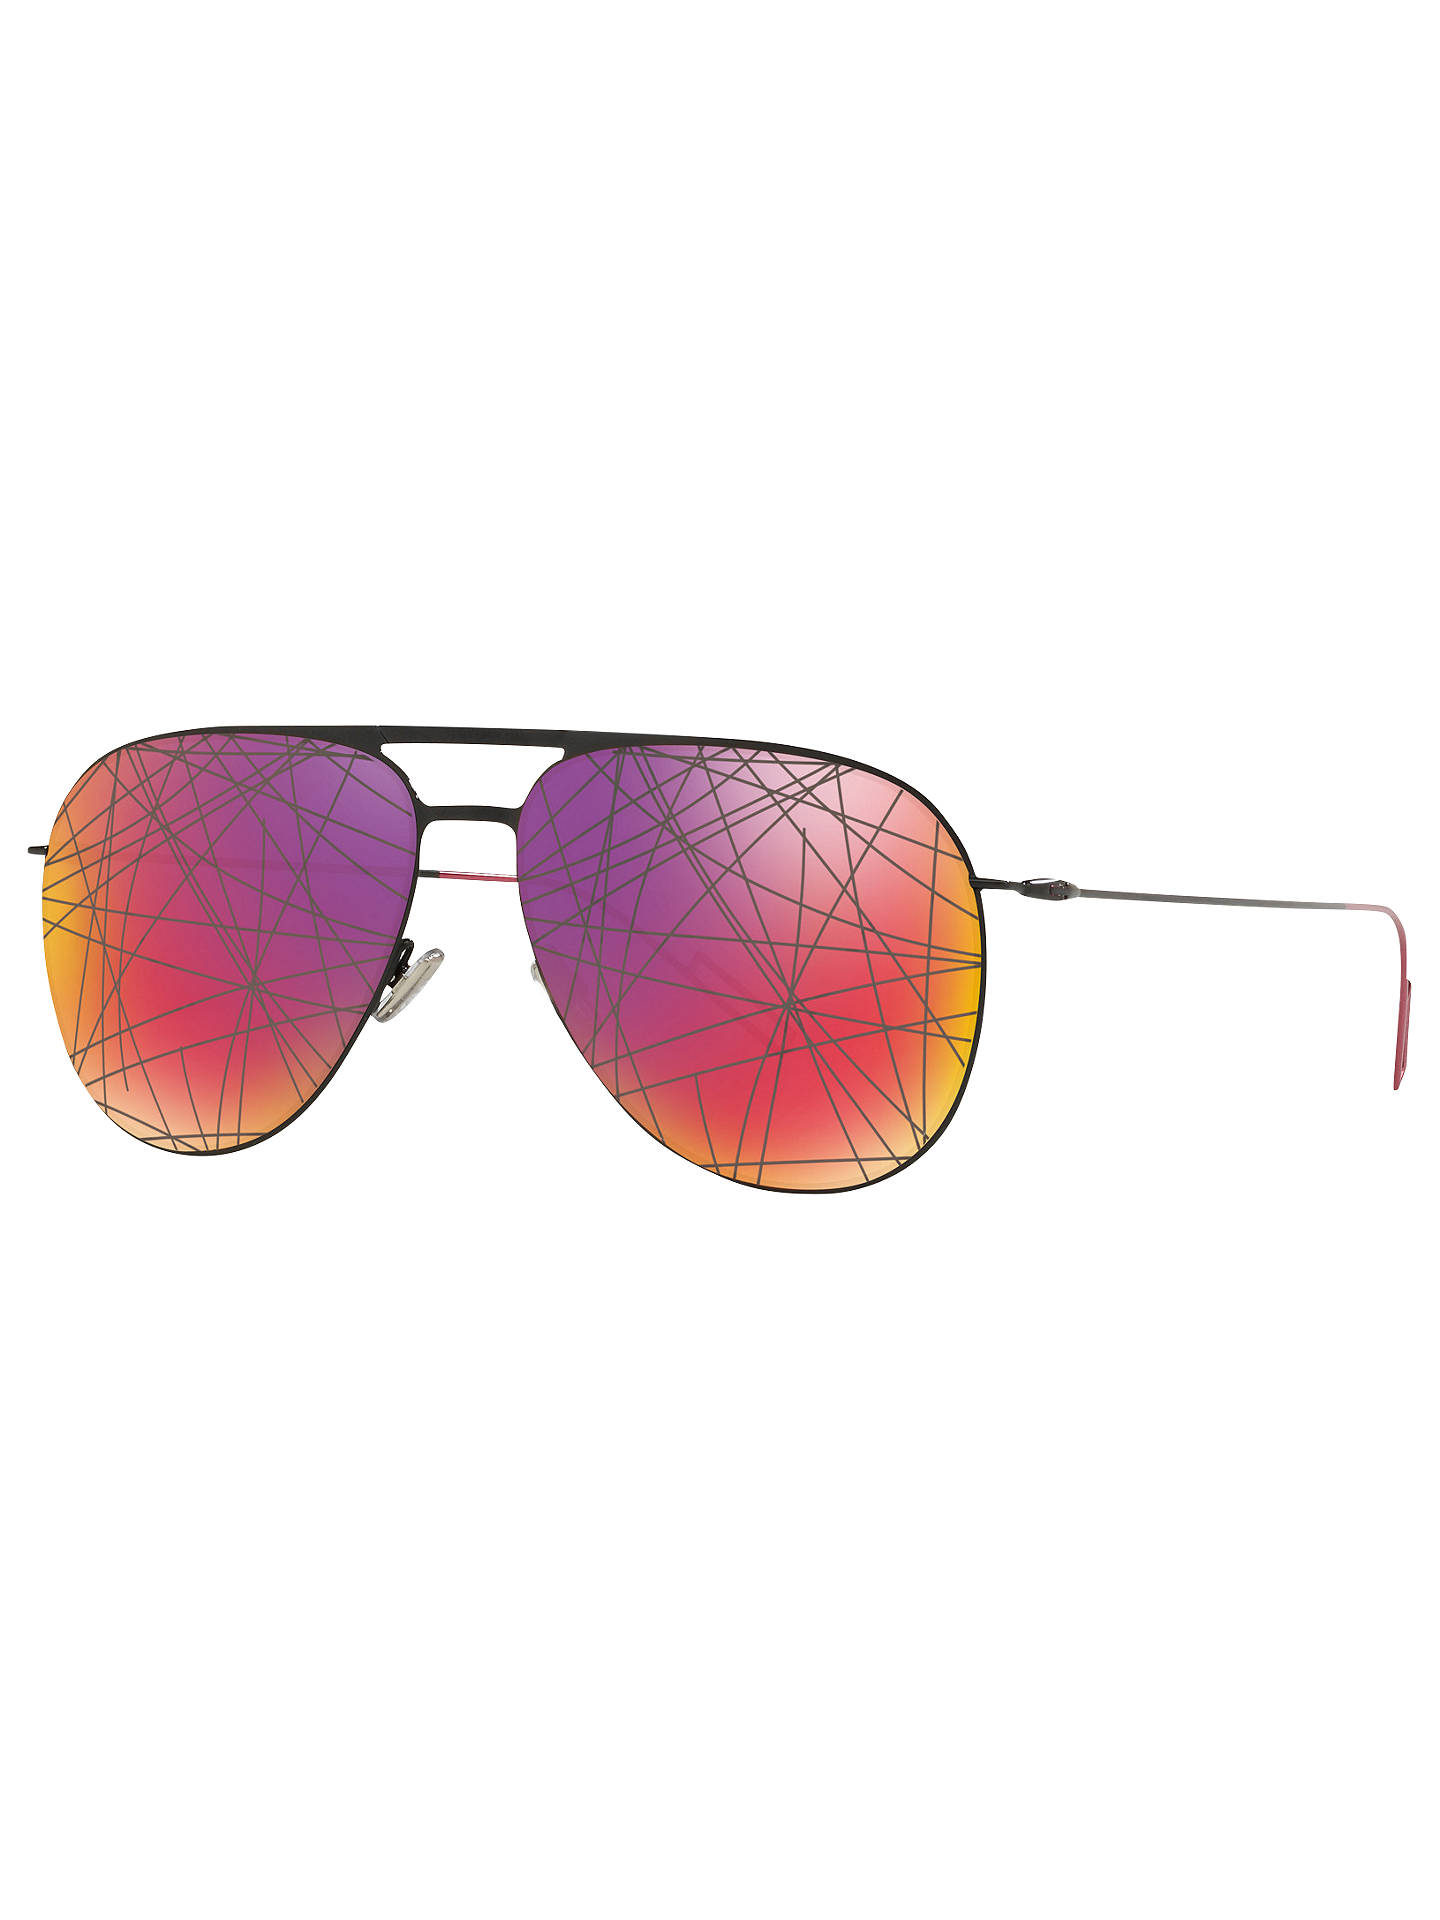 7164840a2b14 Buy Dior Dior0205S Aviator Sunglasses, Black/Multi Online at johnlewis.com  ...